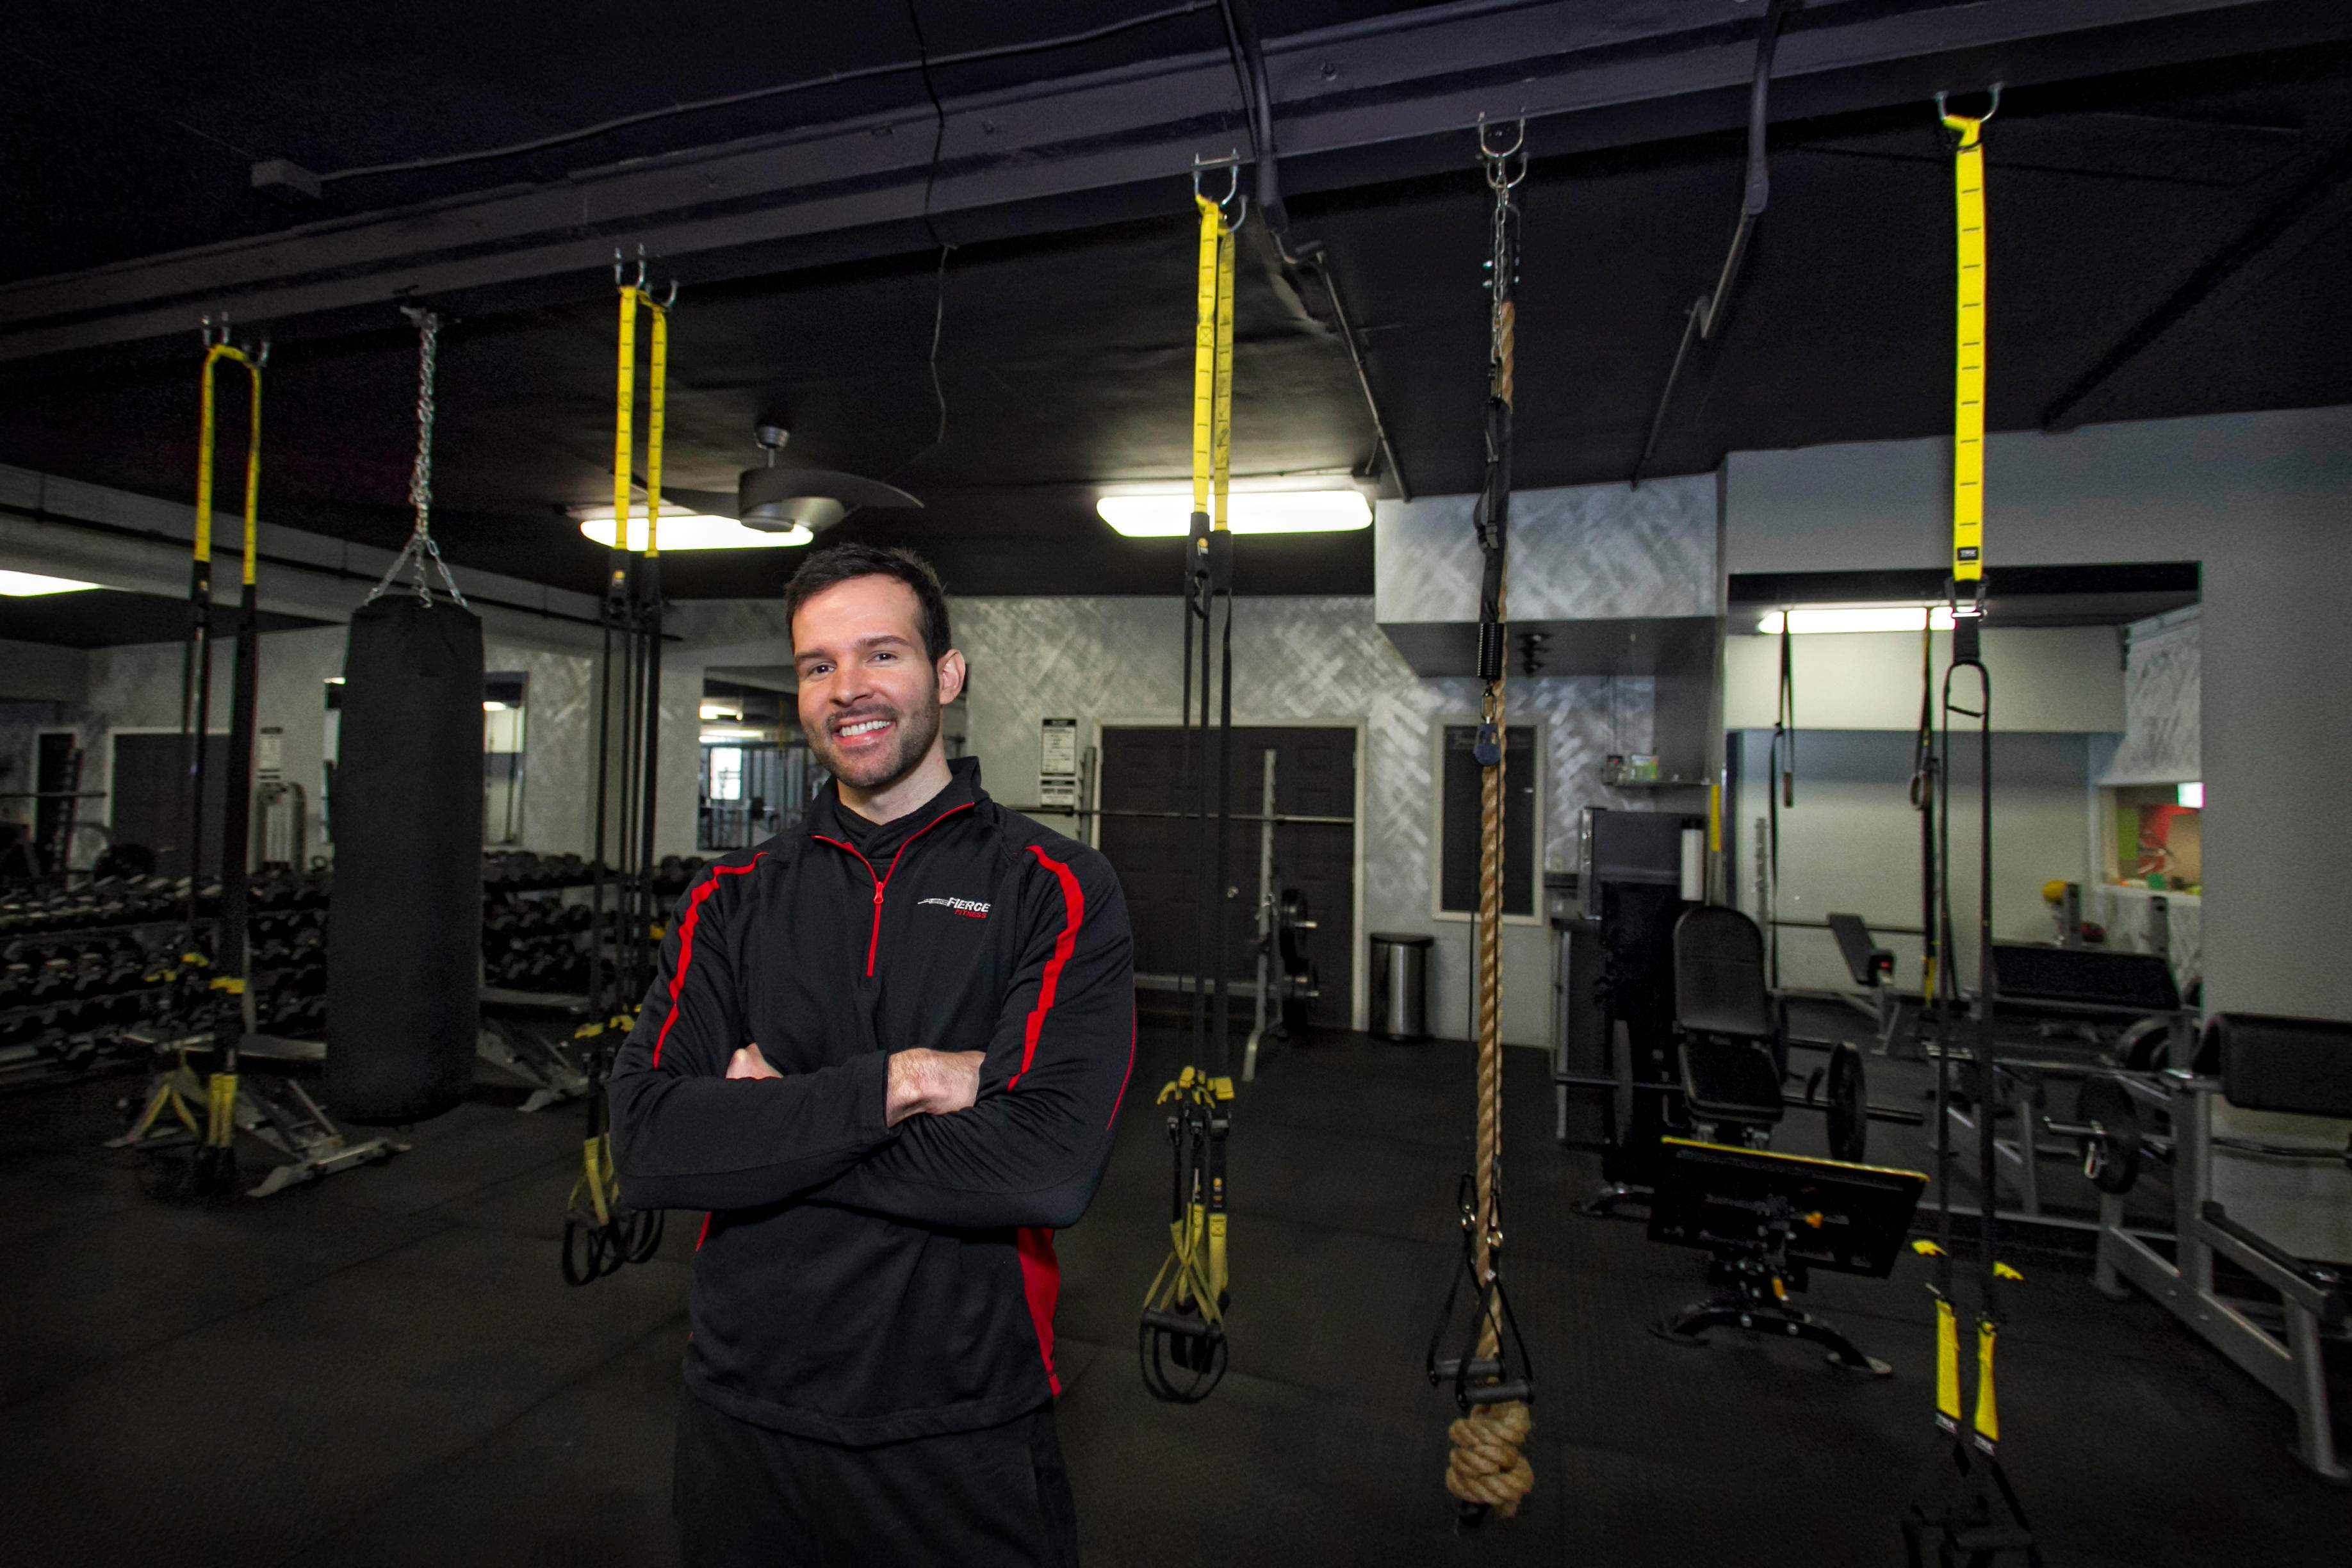 Fierce Fitness LLC image 4